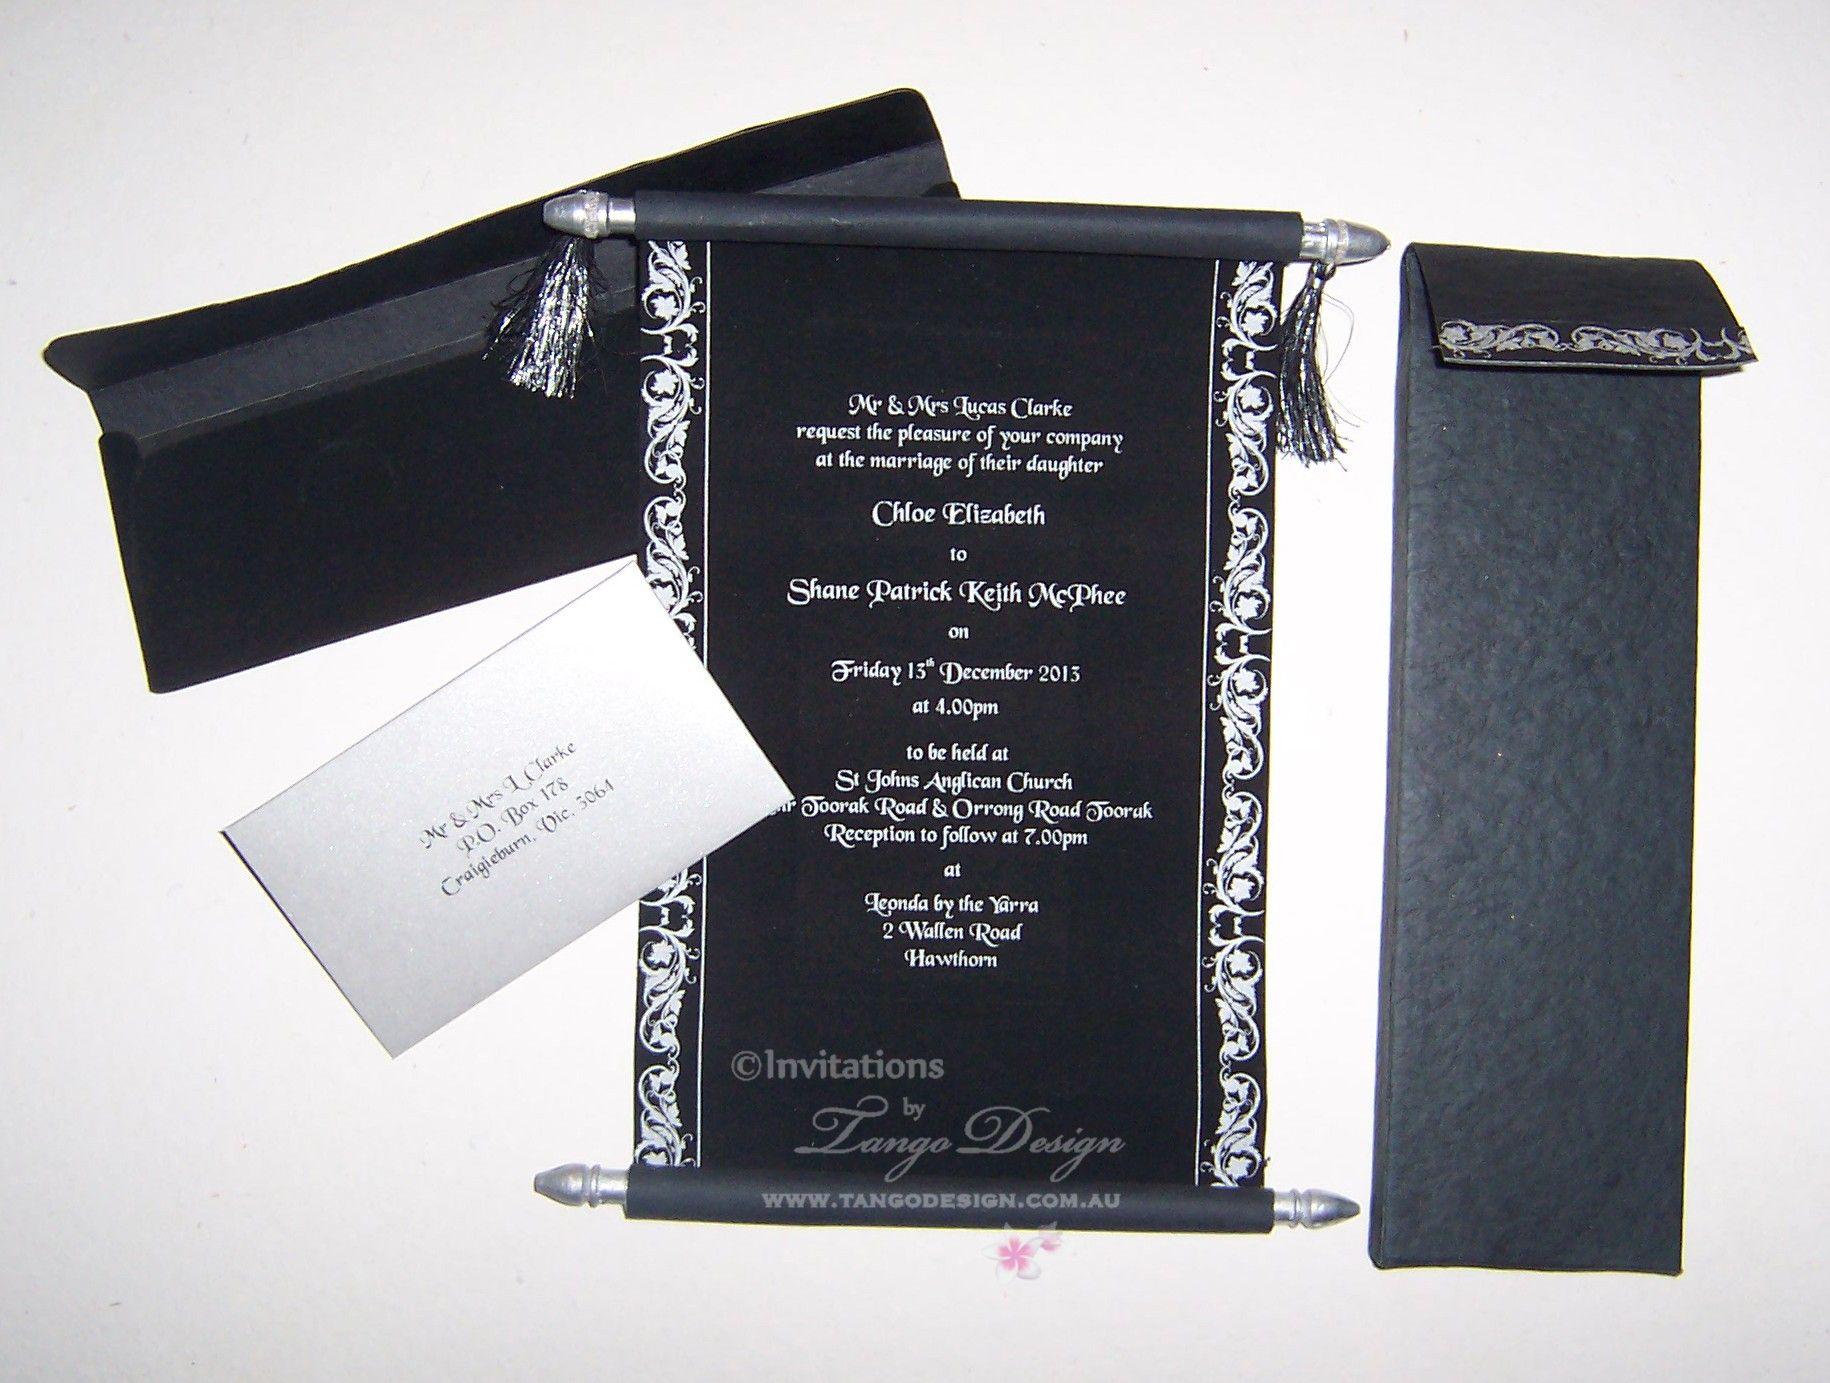 Velvet Wedding Invitations: Royal Velvet Wedding Invitations And Suede Feel Box By Www